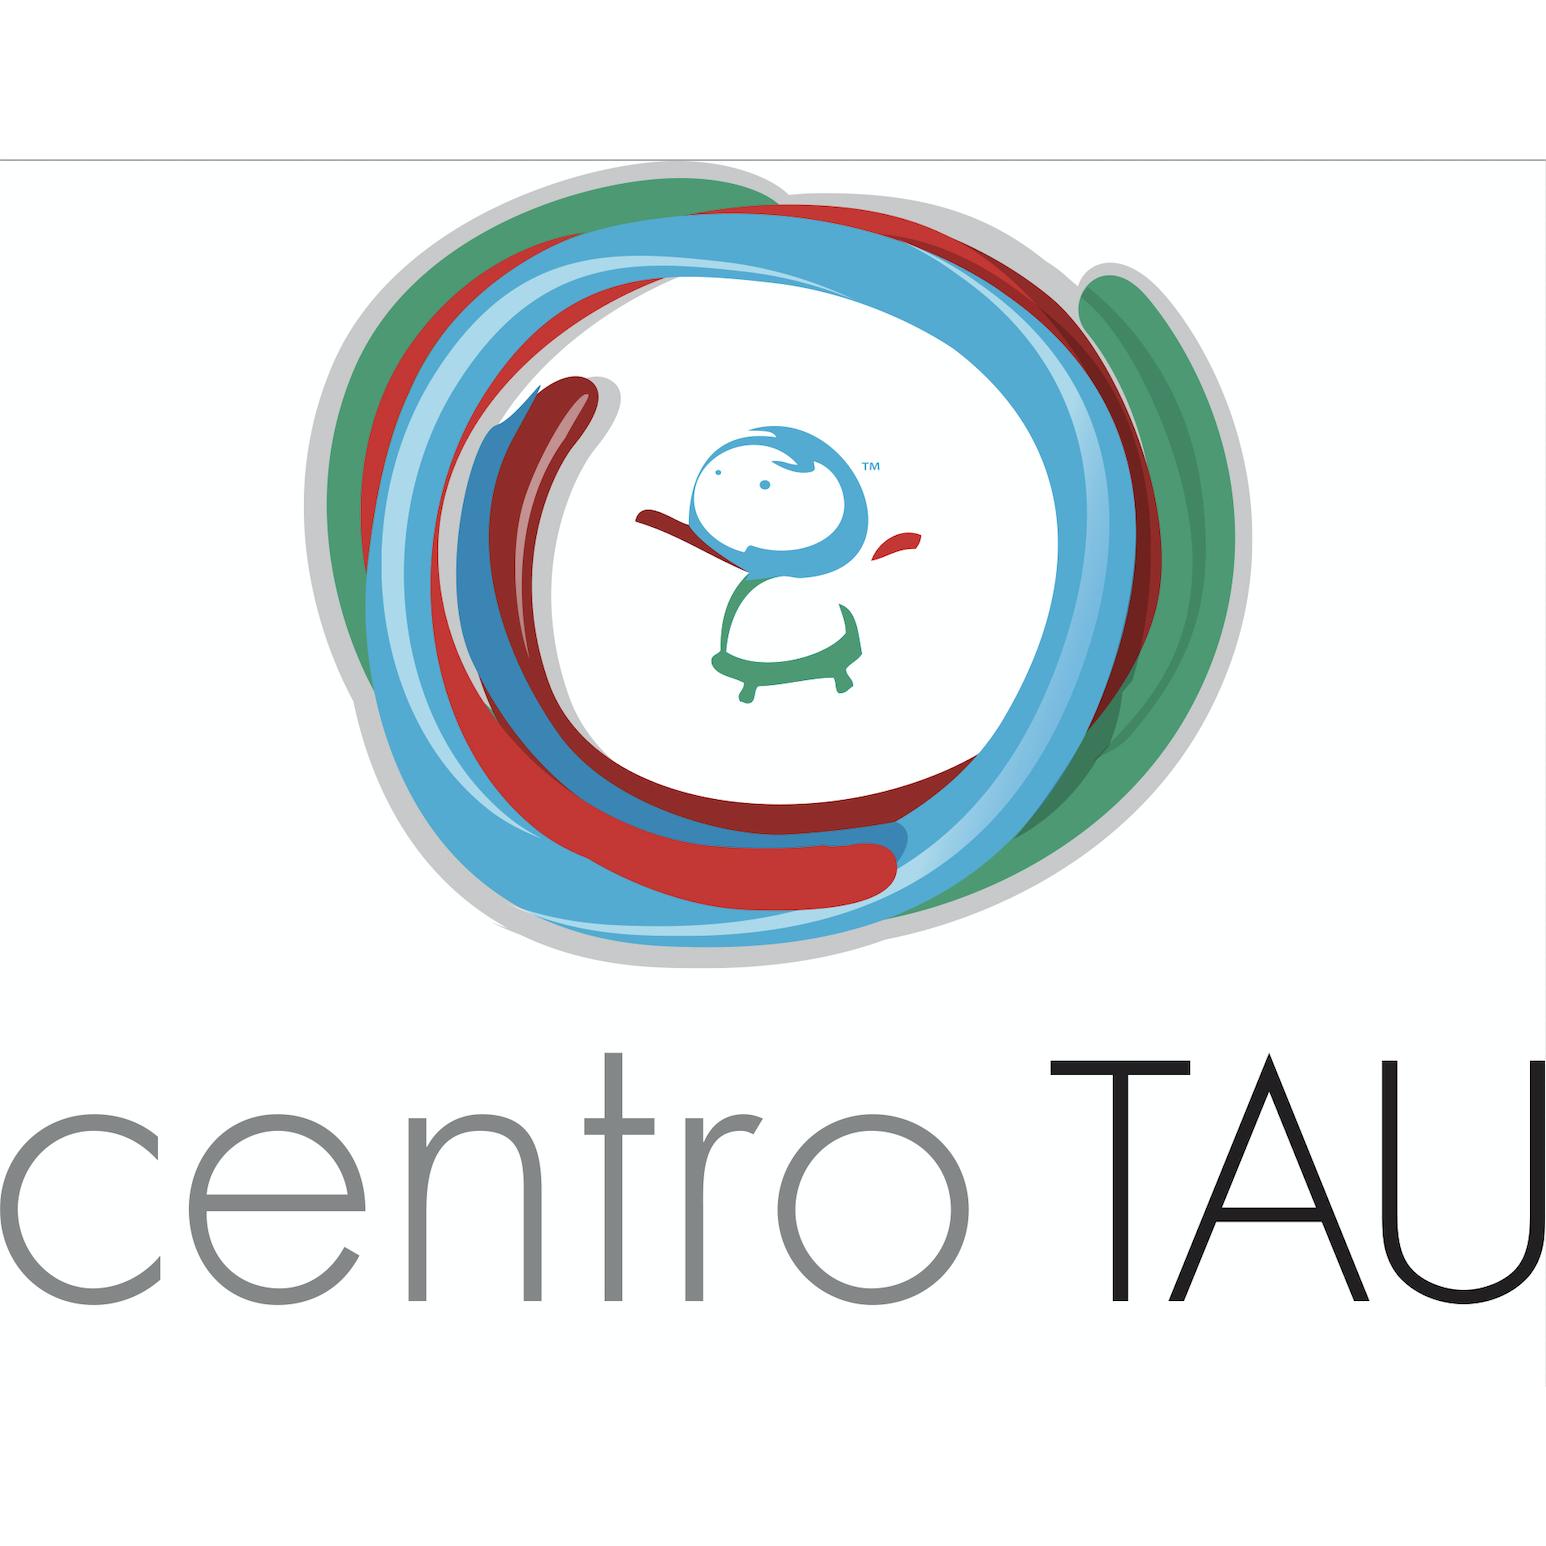 Centro Tau logo.png